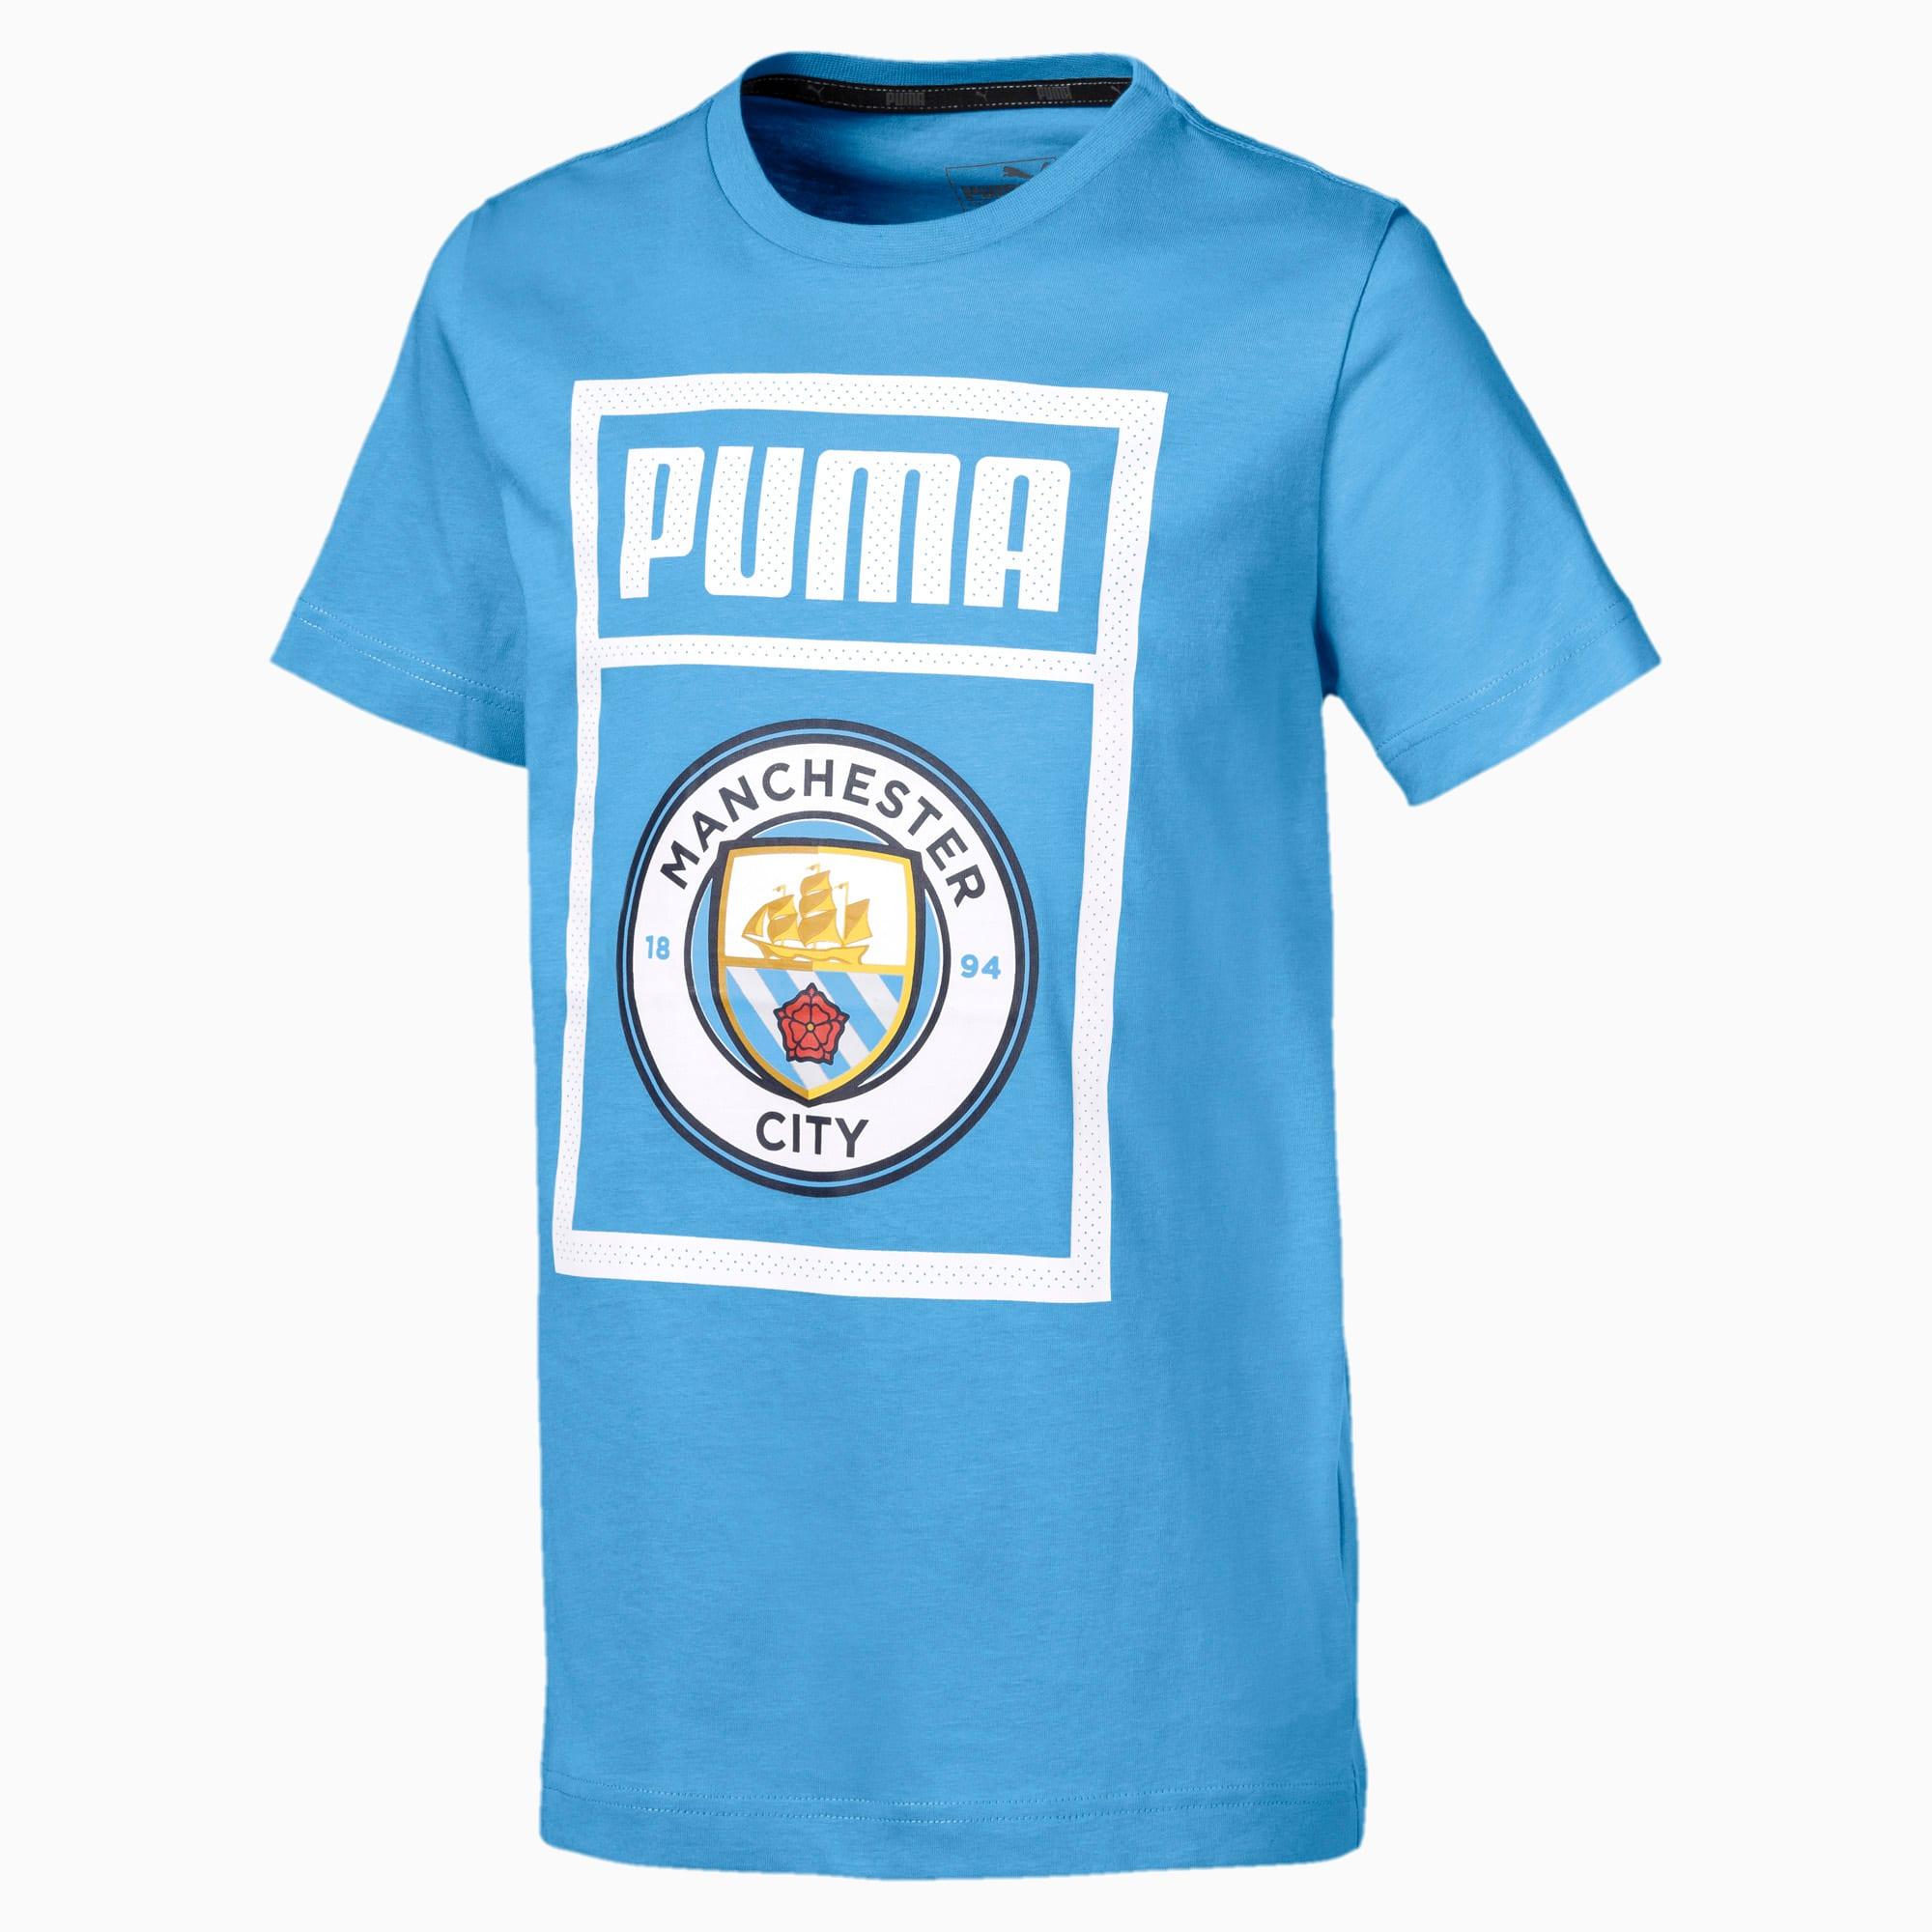 Manchester City Kinder Shoe Tag T Shirt   Team Light Blue